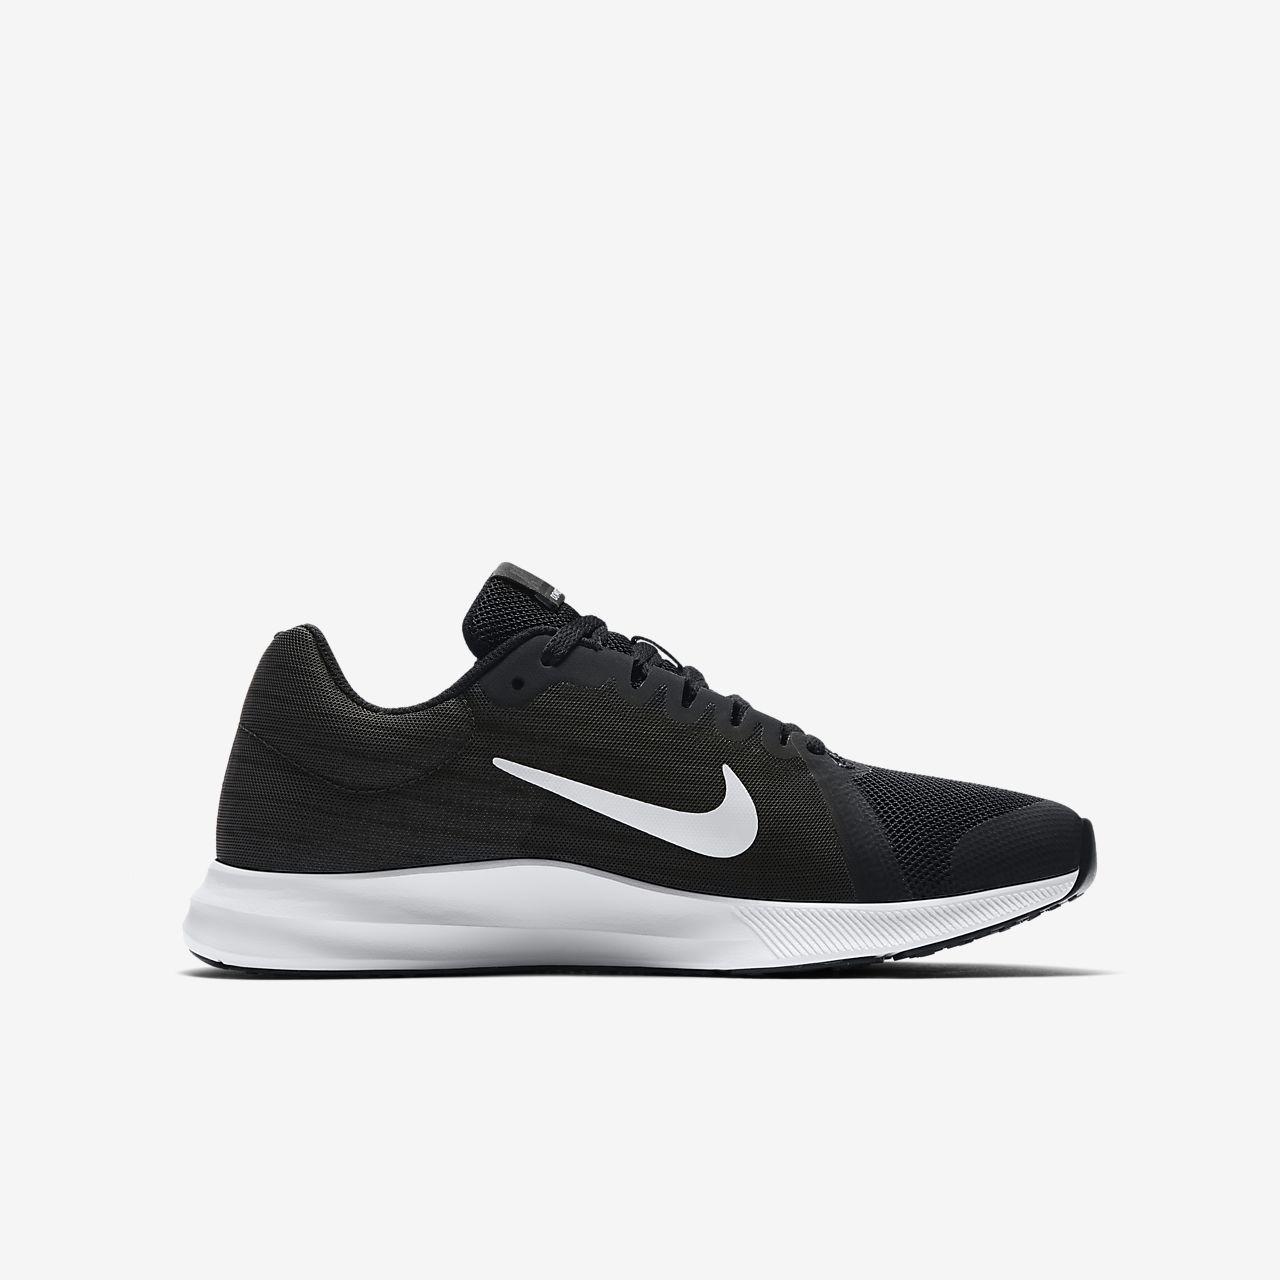 3d1e876d0bd Nike Downshifter 8 Older Kids  (Boys ) Running Shoe. Nike.com NL